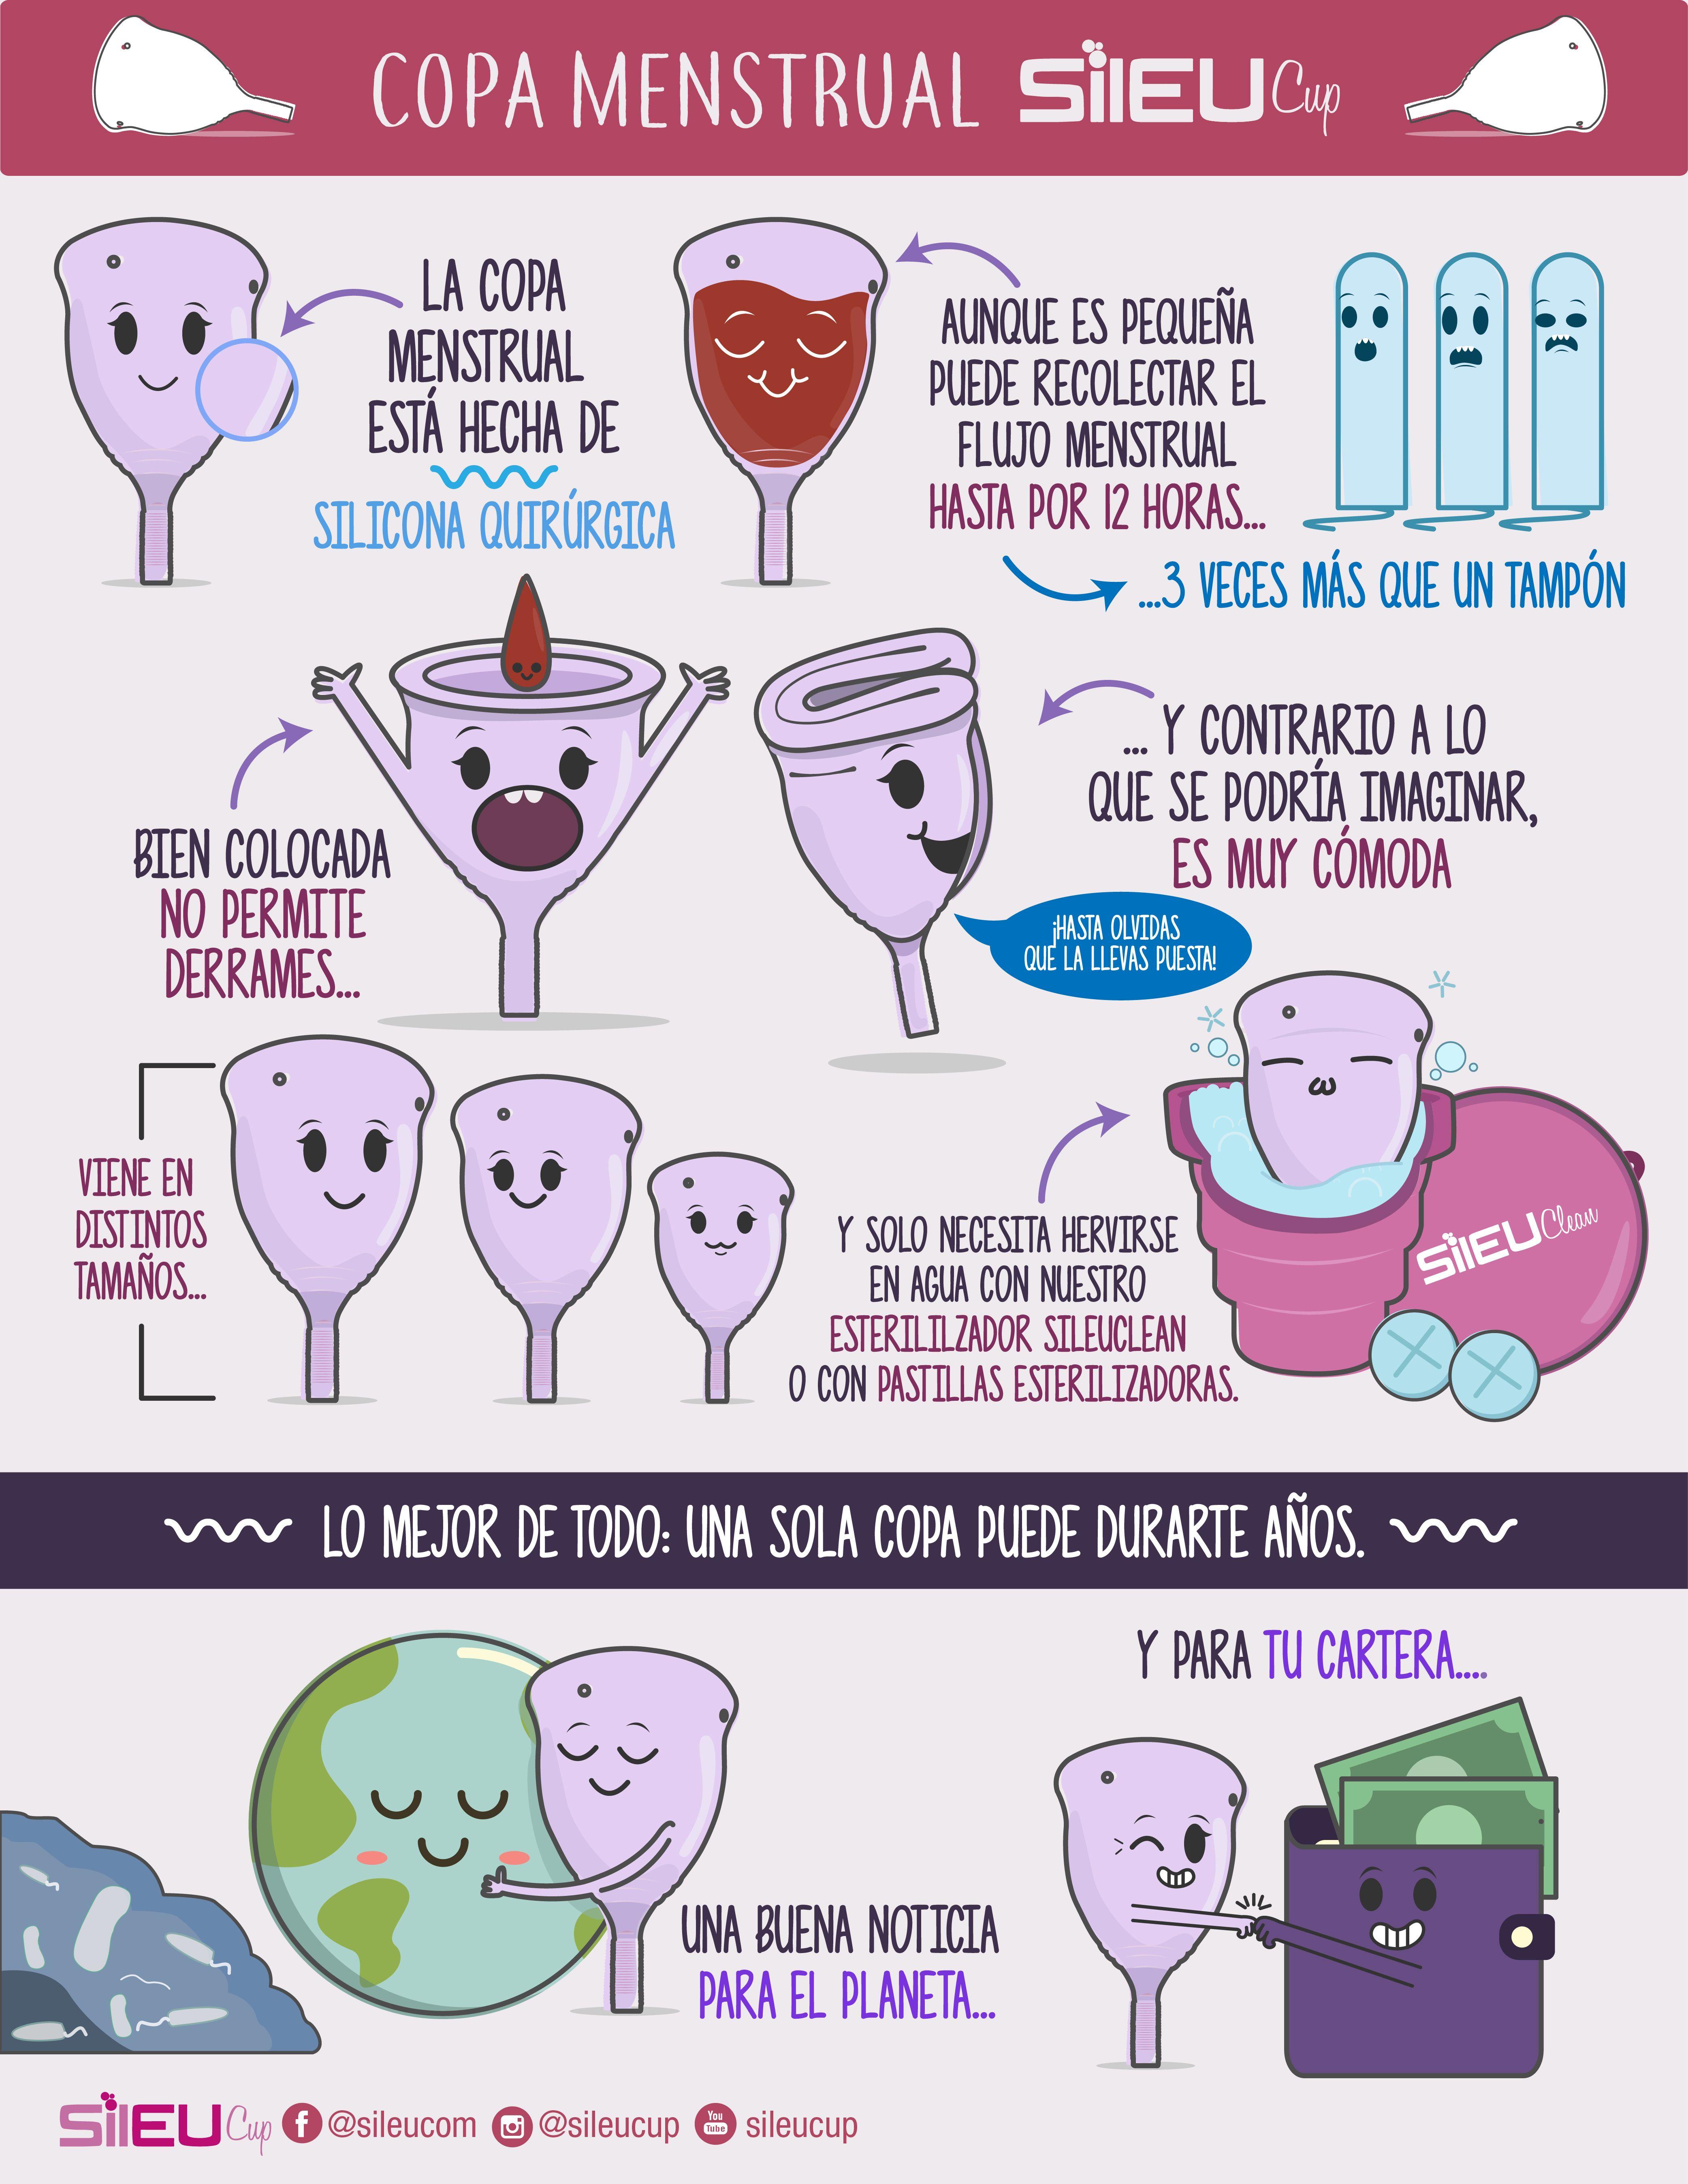 Ventajas De Usar La Copamenstrual Sileucup Copa Menstrual Higiene Femenina Copas Menstruales